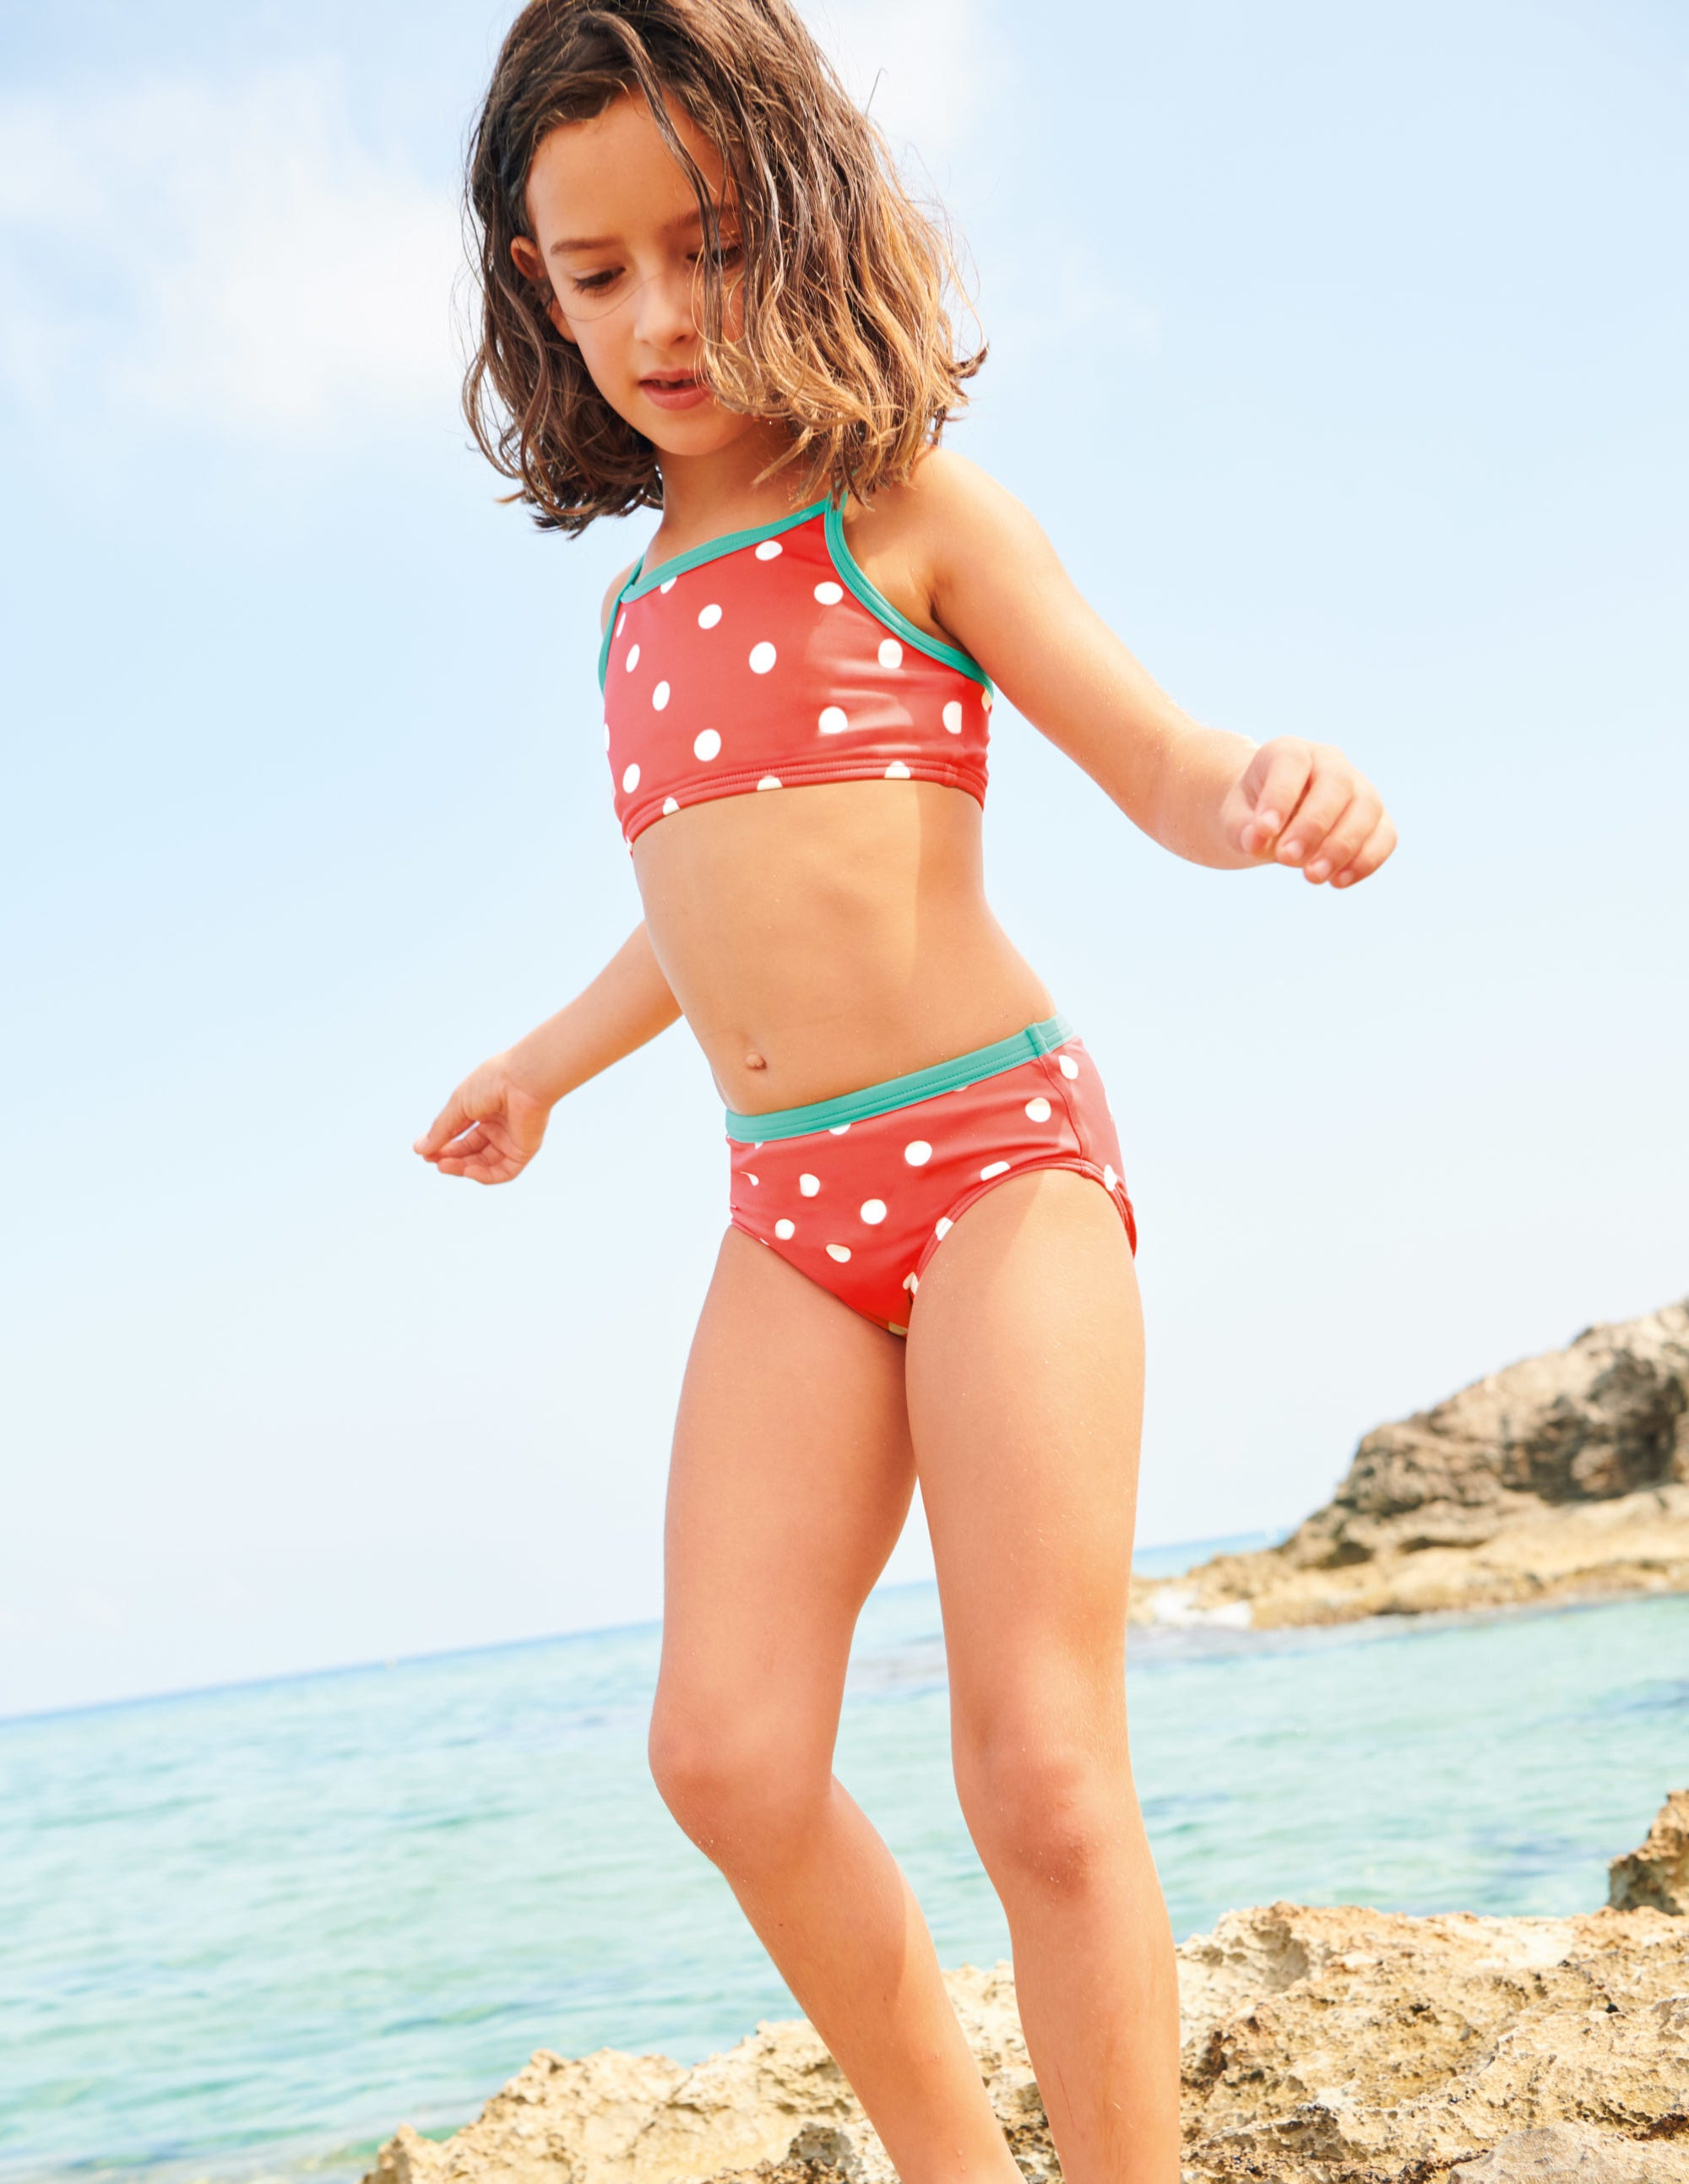 Boden Patterned Bikini Top - Sunset Red/Ivory Spot